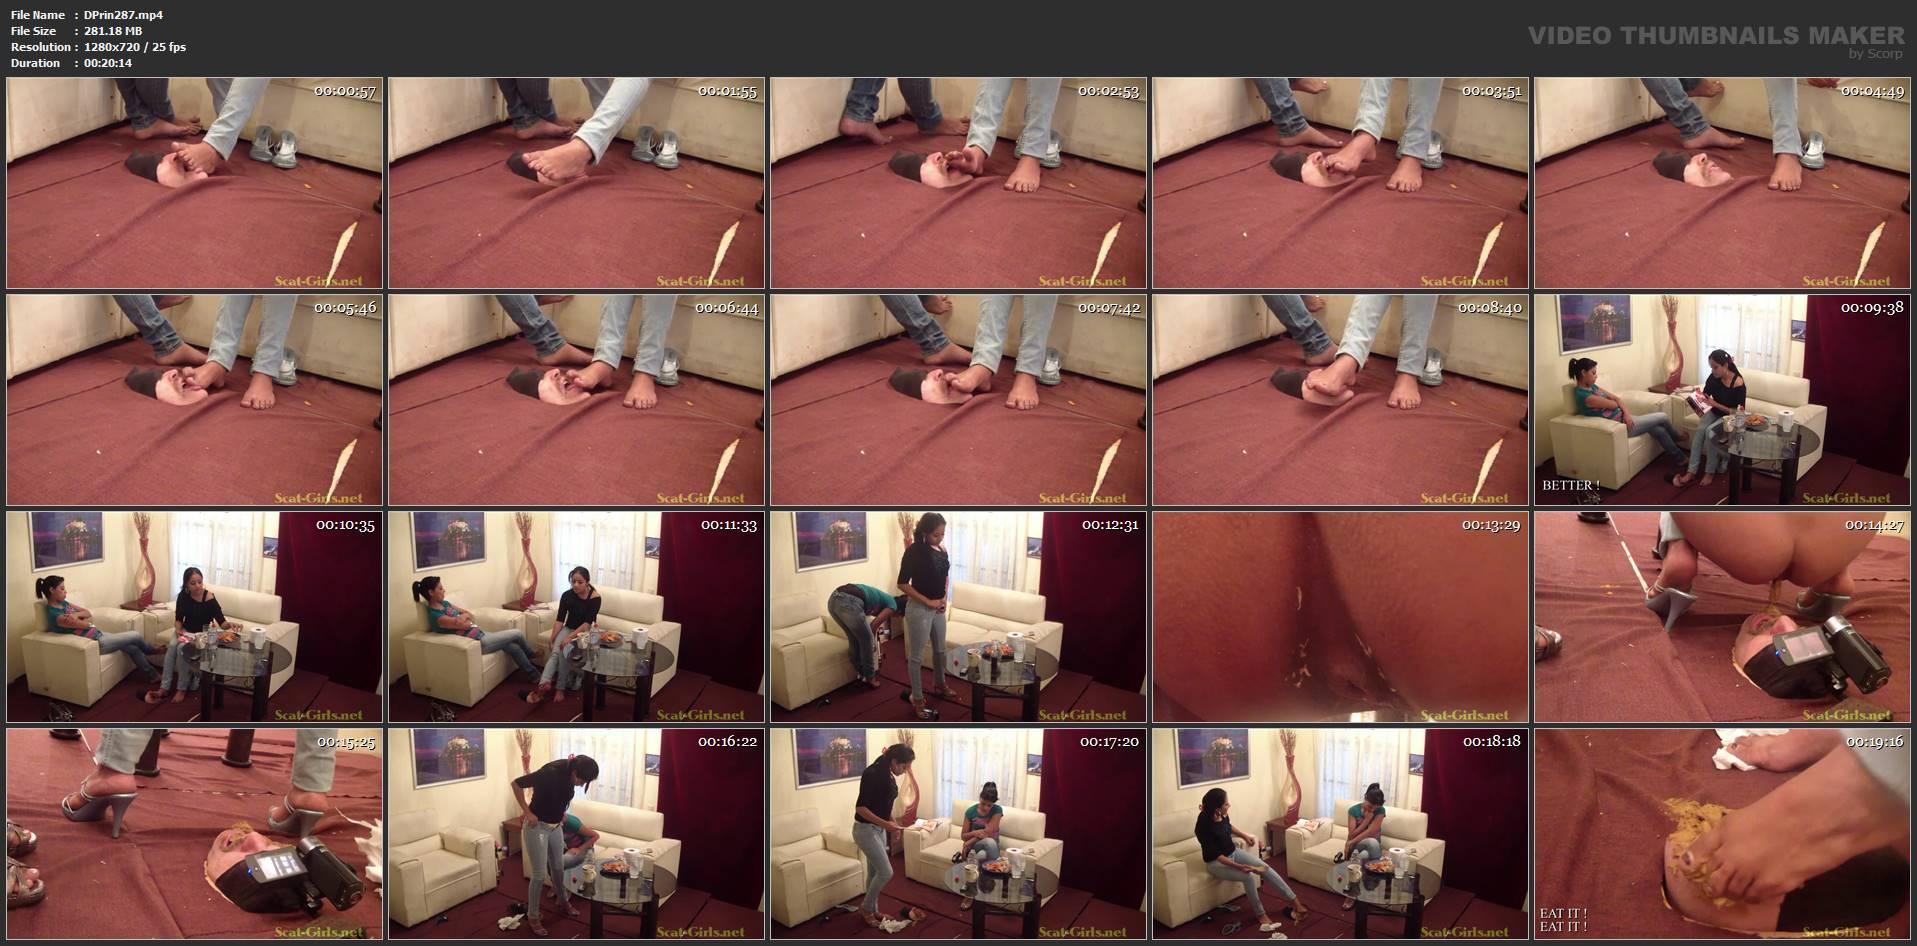 [DOM-PRINCESS] Move It Floor Face Scat Part 1 [HD][720p][MP4]